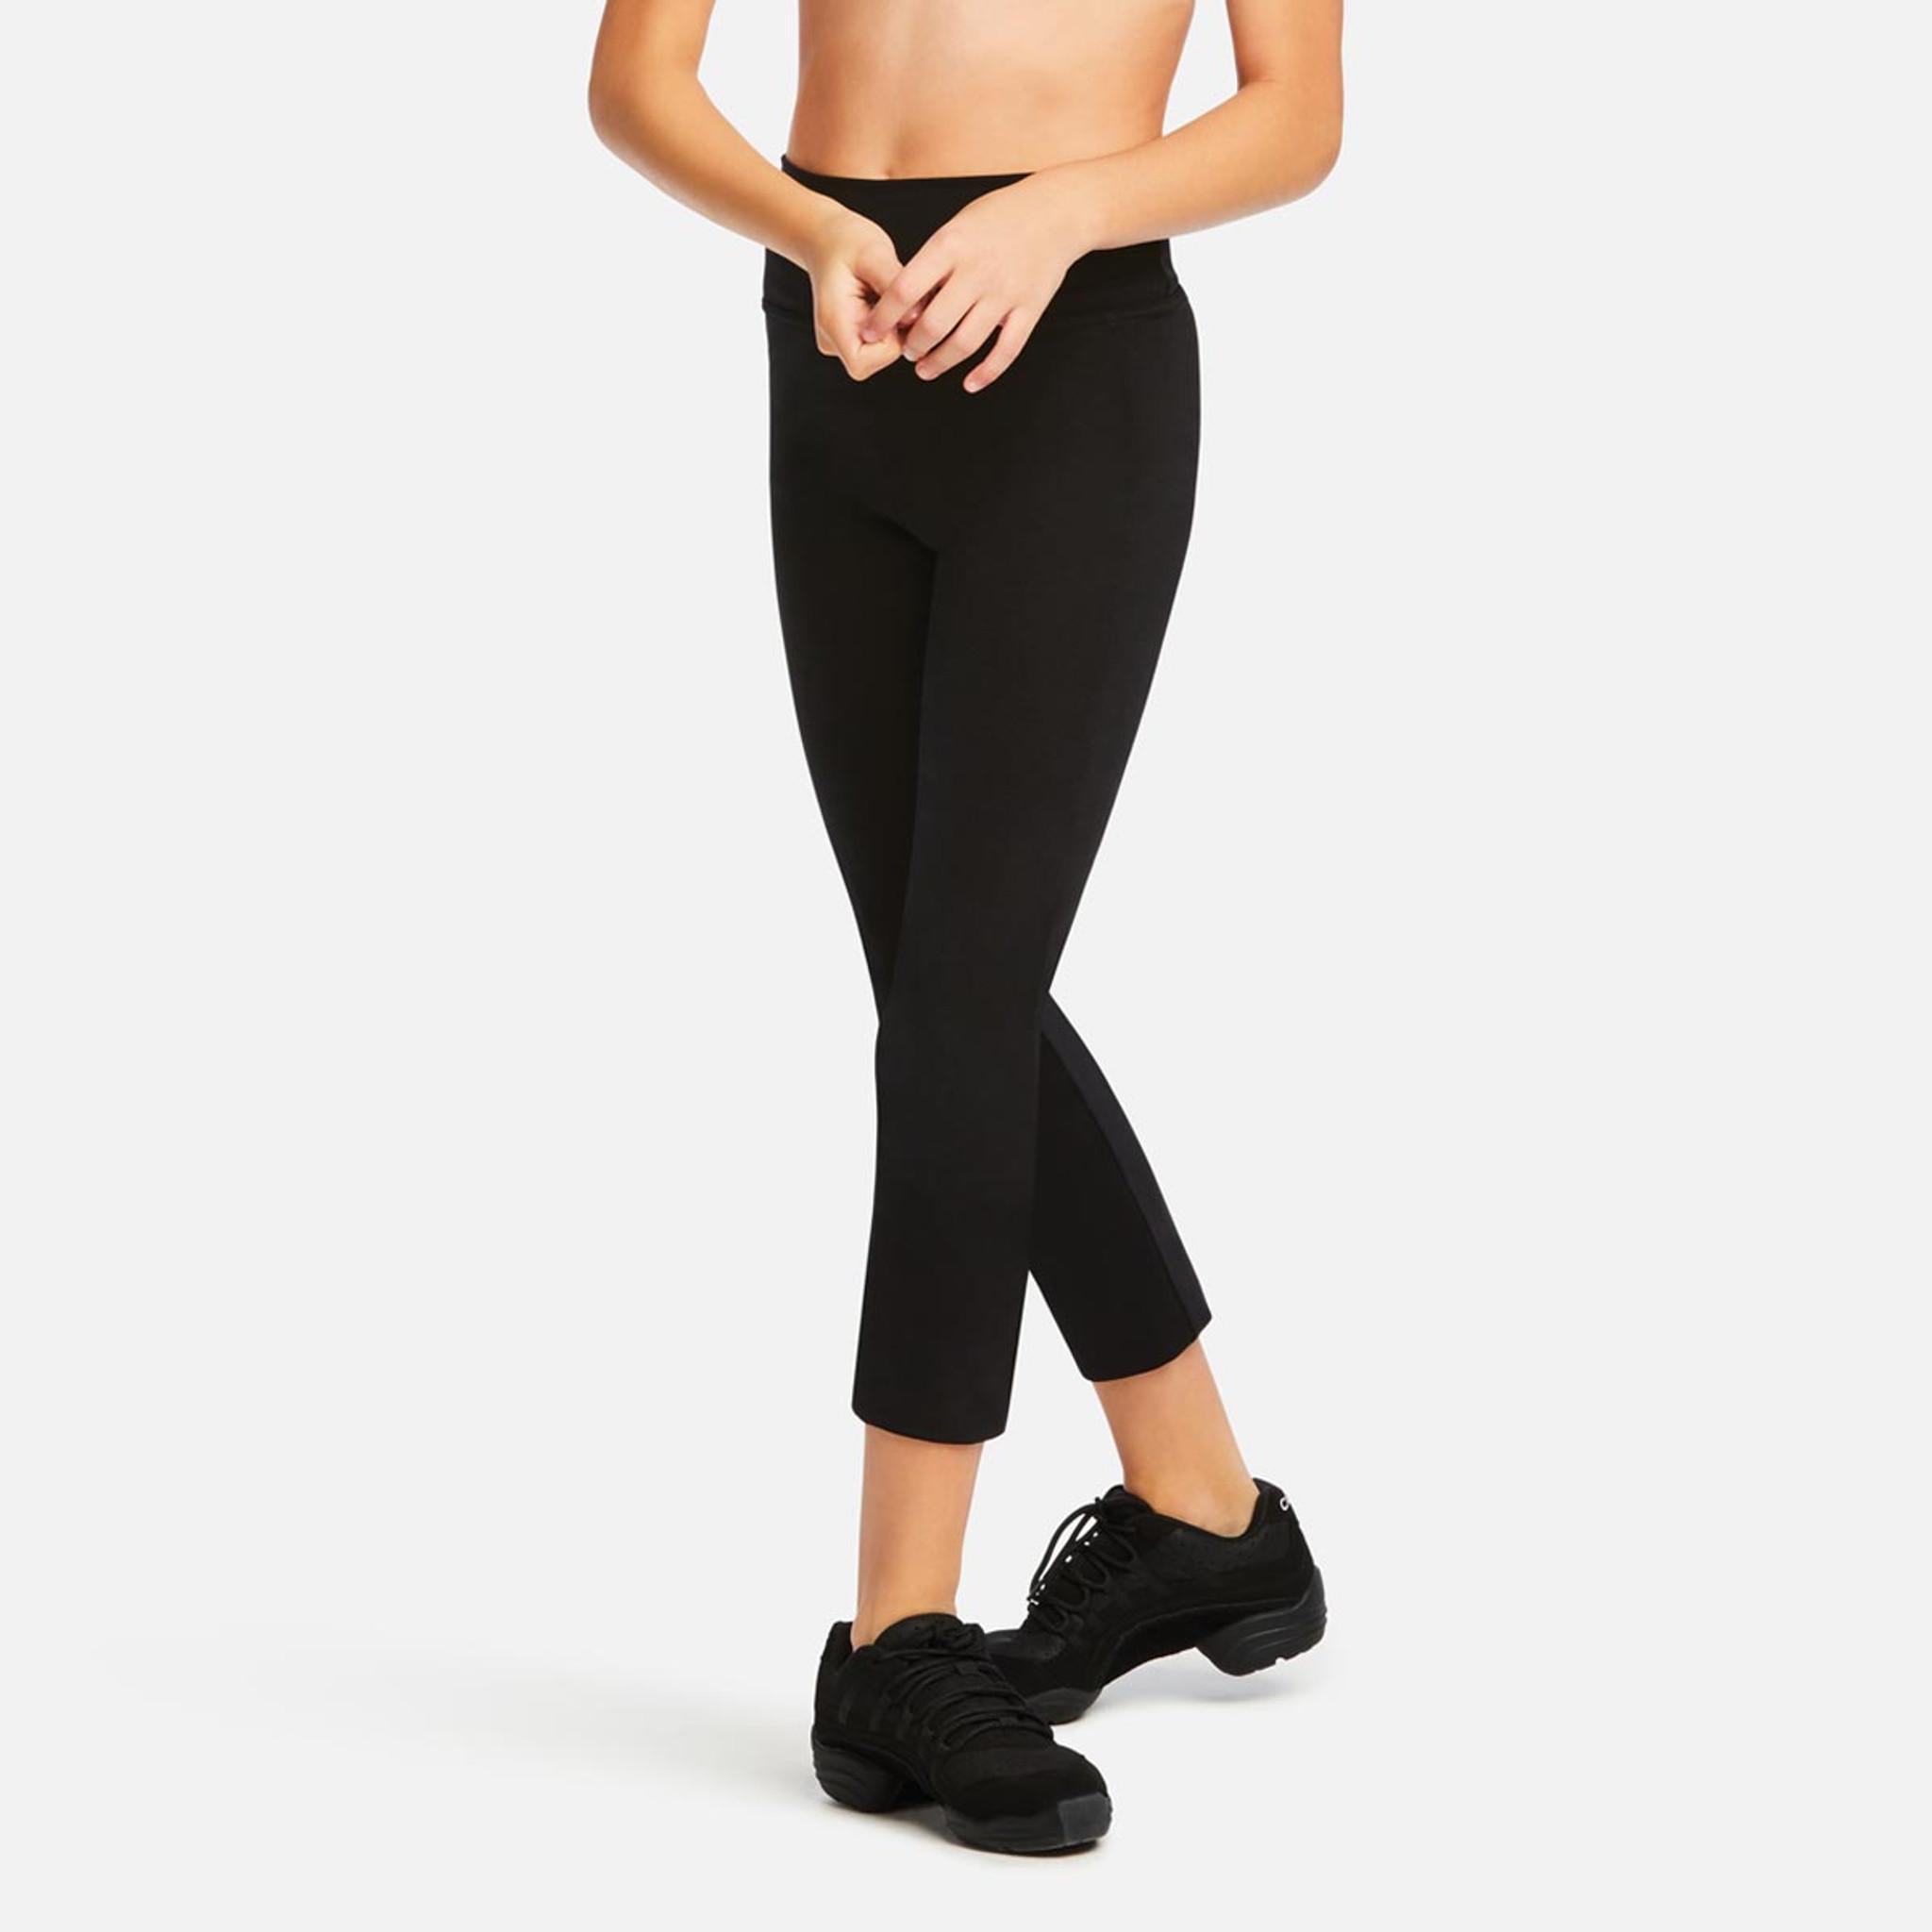 8633c286e Capezio High Waist Tights - Girls Activewear Legging - DANCE DIRECT®